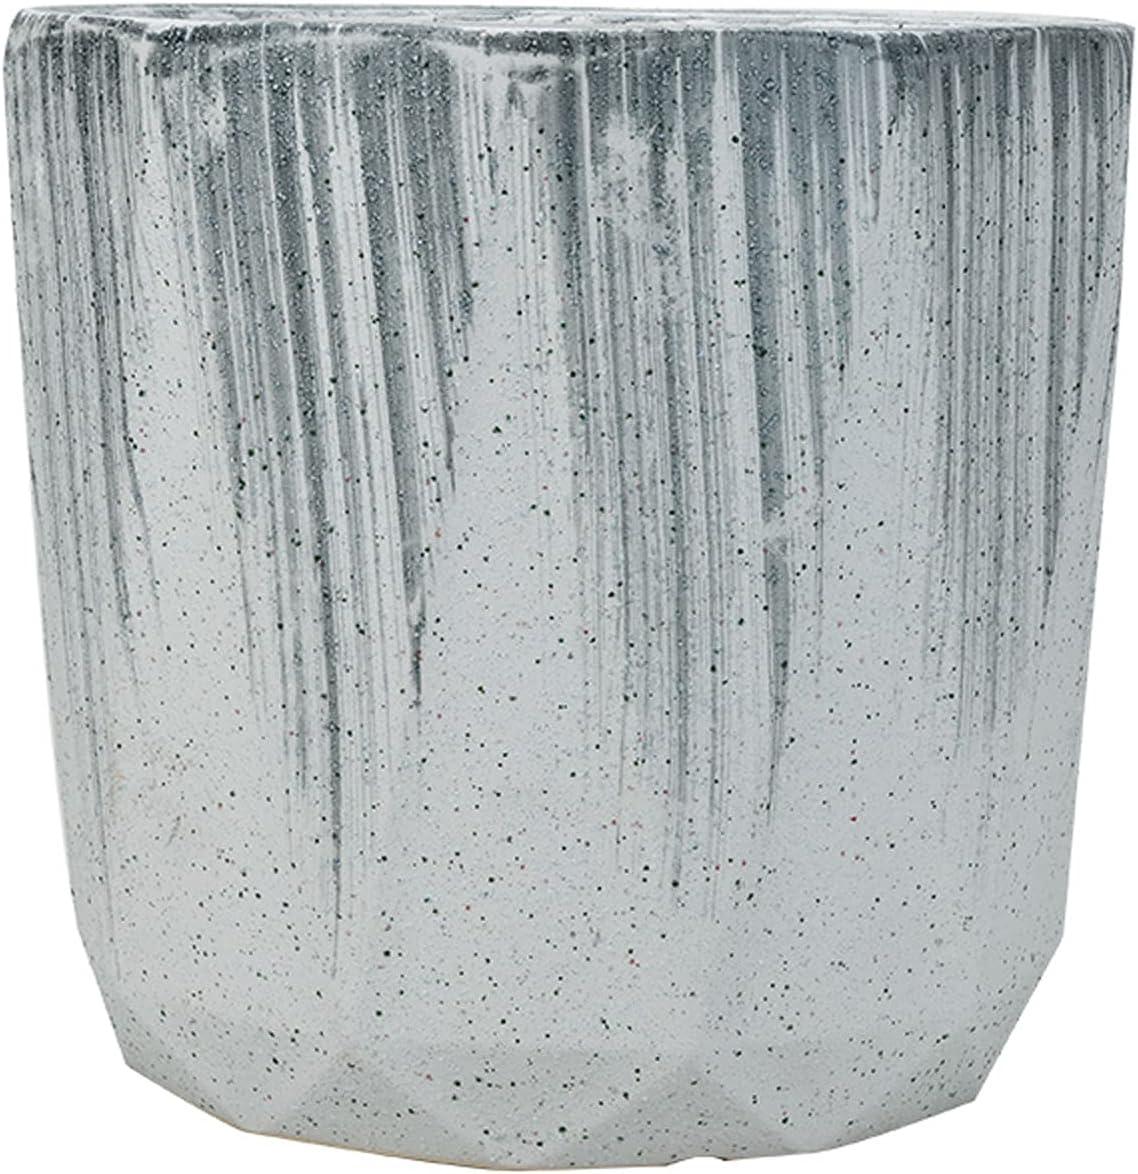 Jjshueryg Popular popular Nordic Minimalist Department store Ceramic Desktop Flowerpot Floor Flow